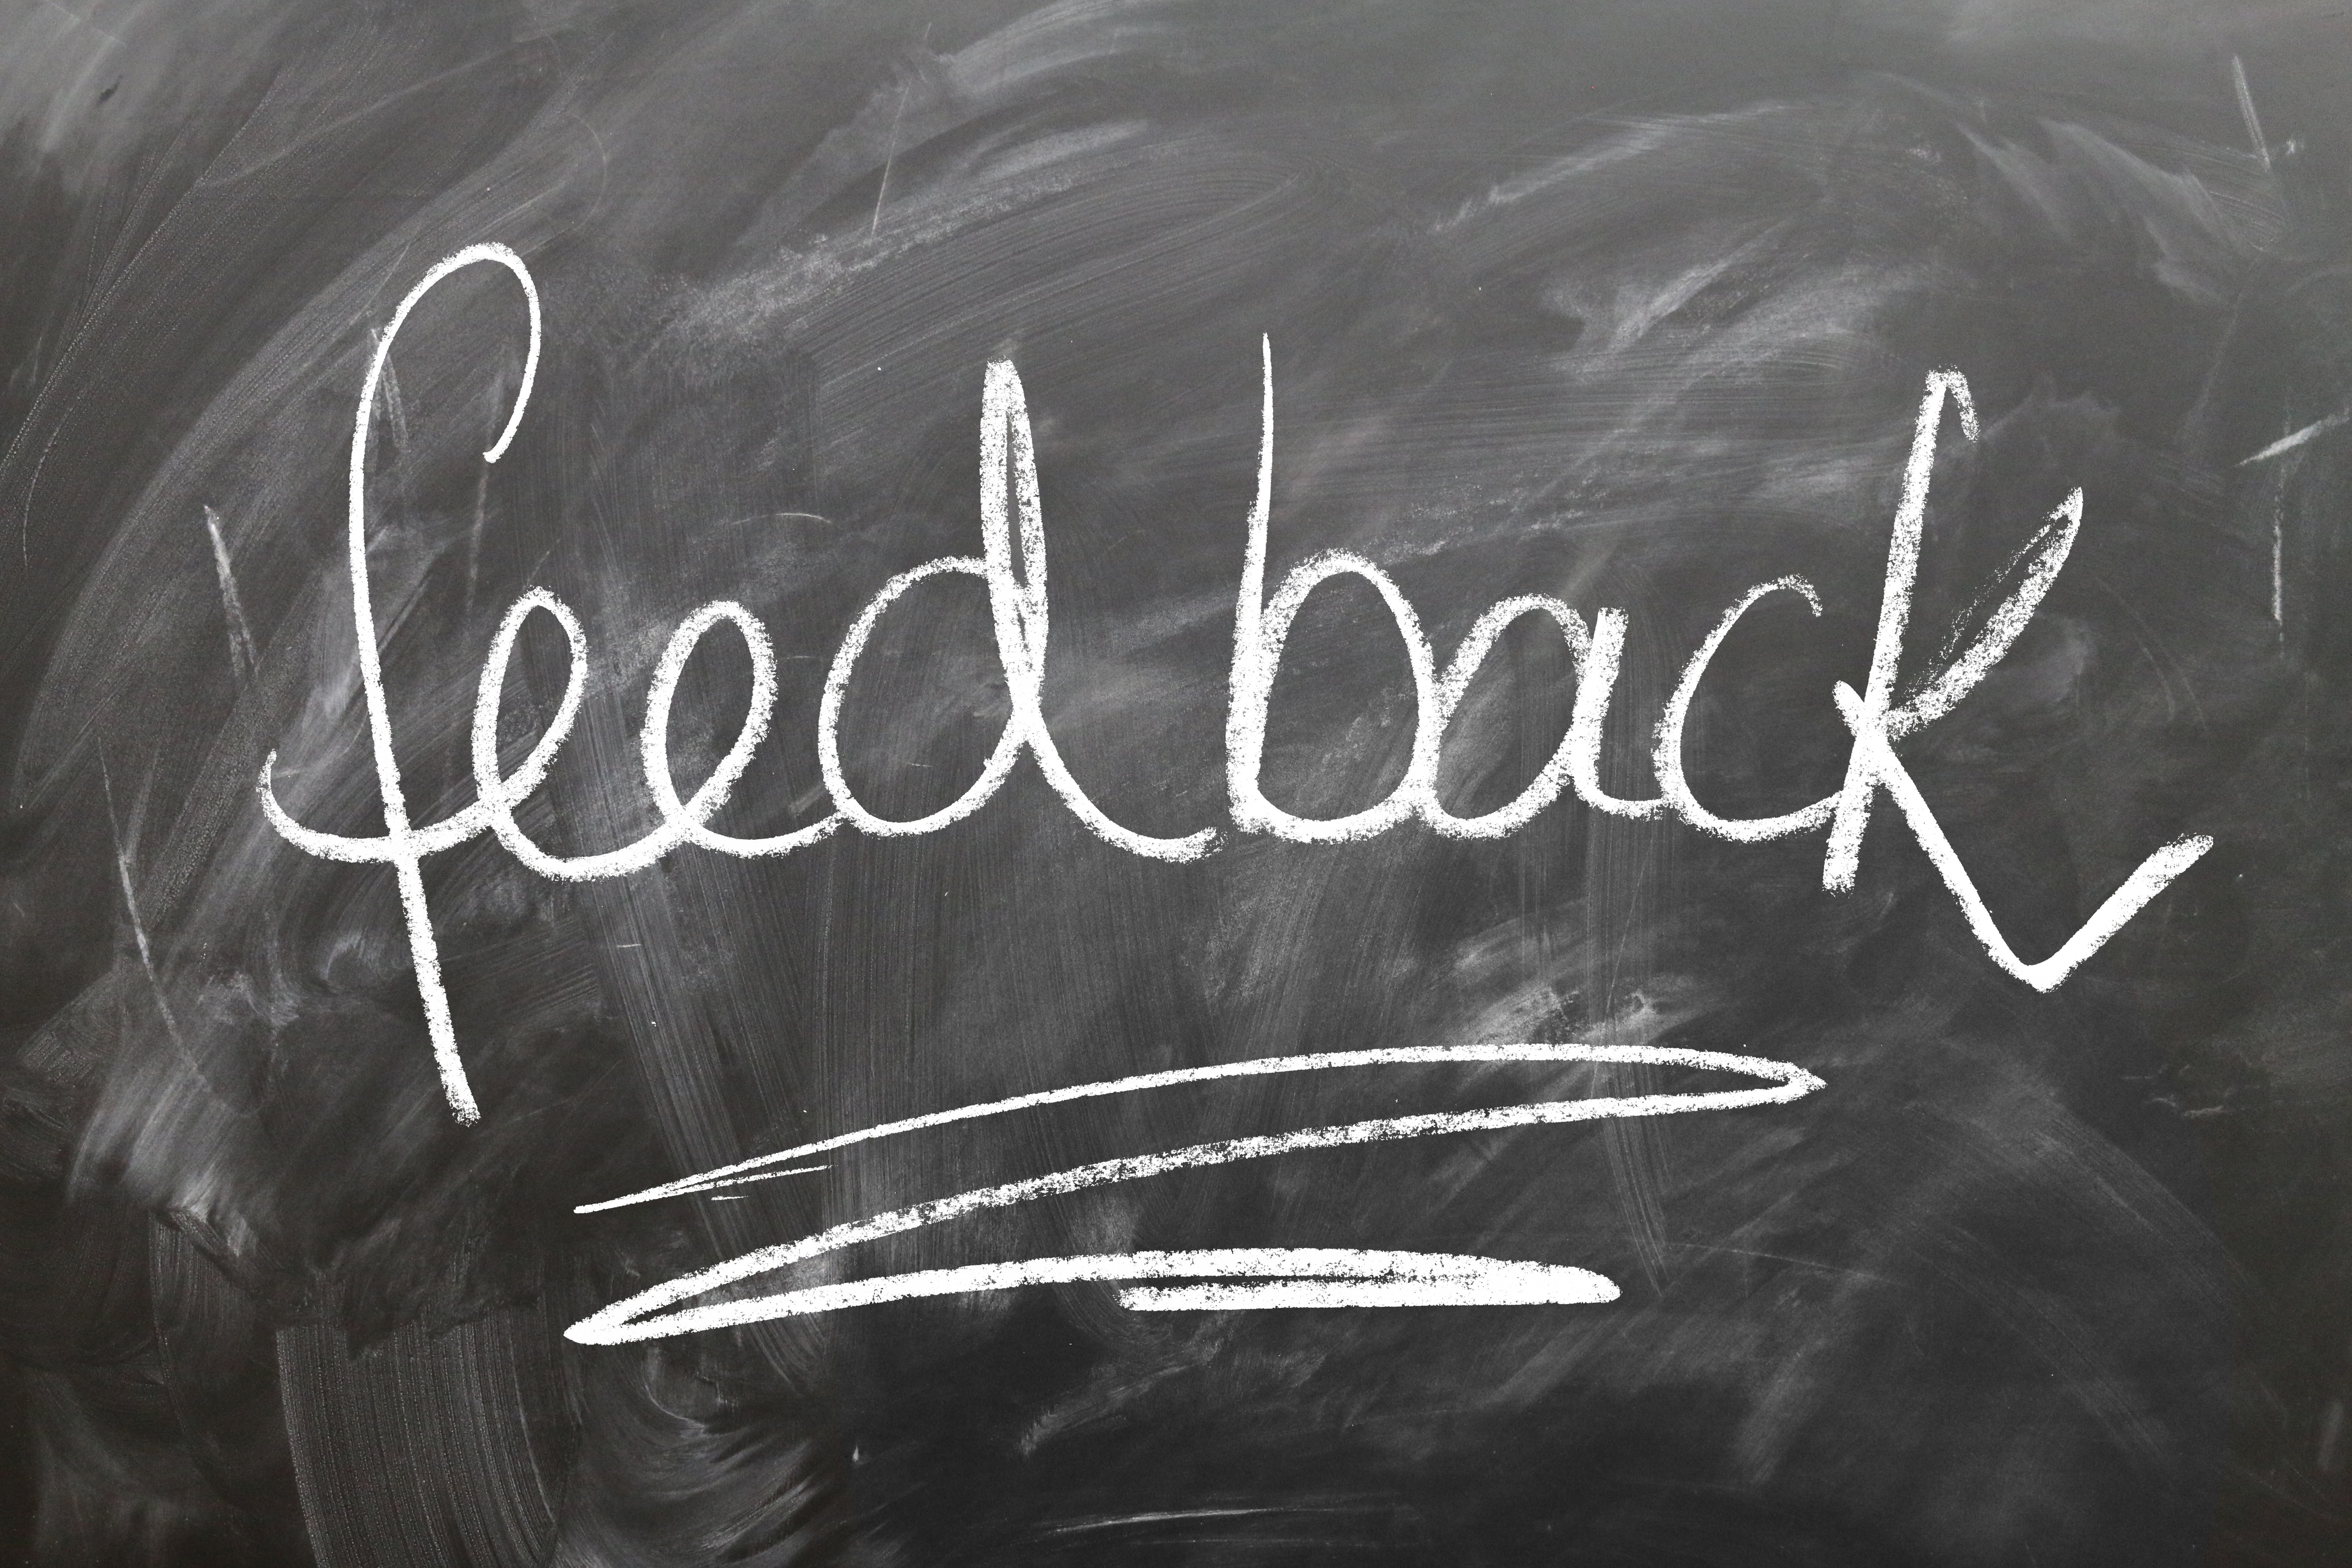 feedback-blackboard.jpg